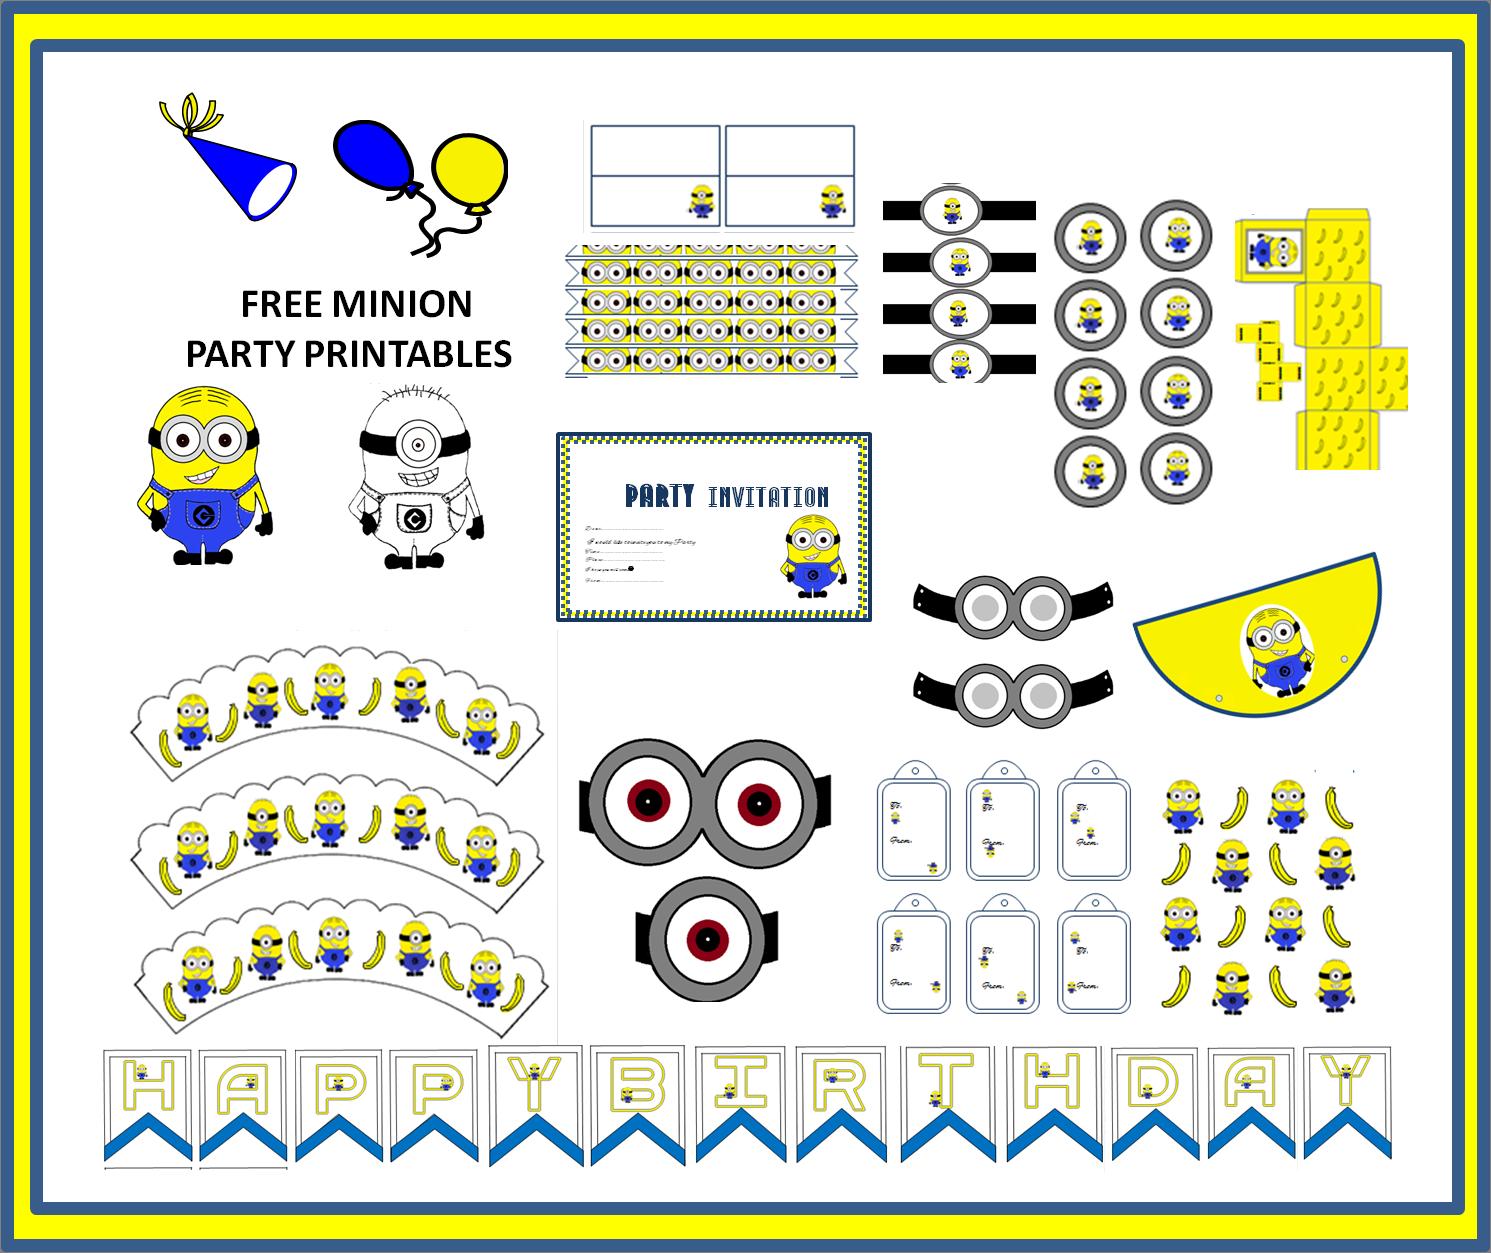 Lots Of Free Minion Party Printable Minion Party Minion Birthday Invitations Minion Party Theme